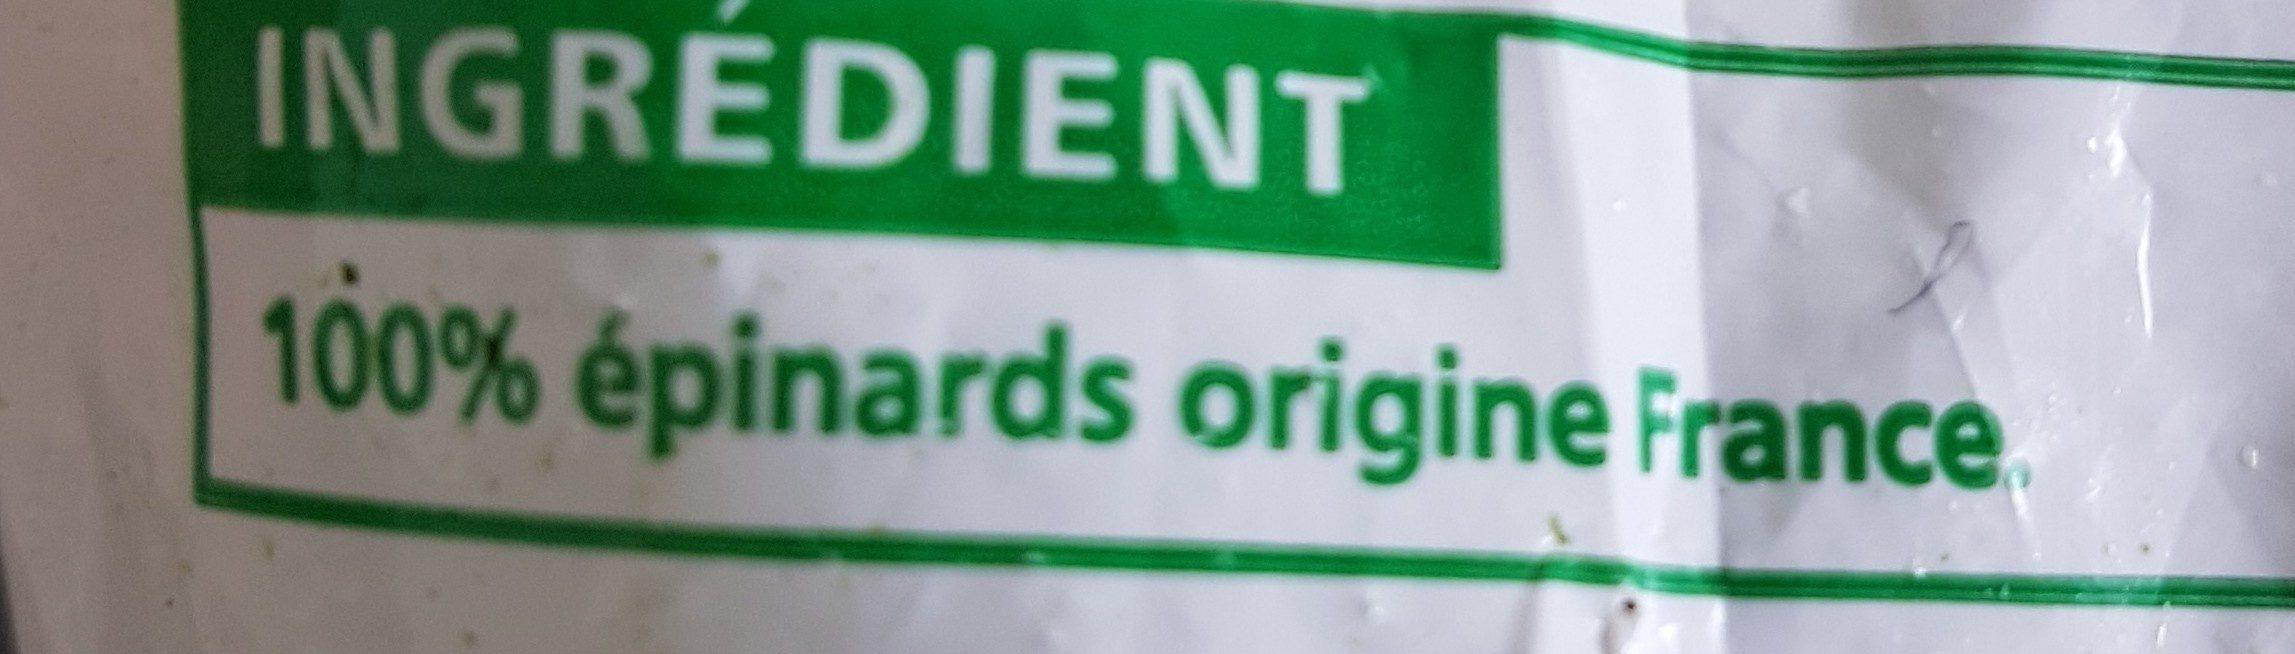 Epinard en Branches - Ingredienti - fr